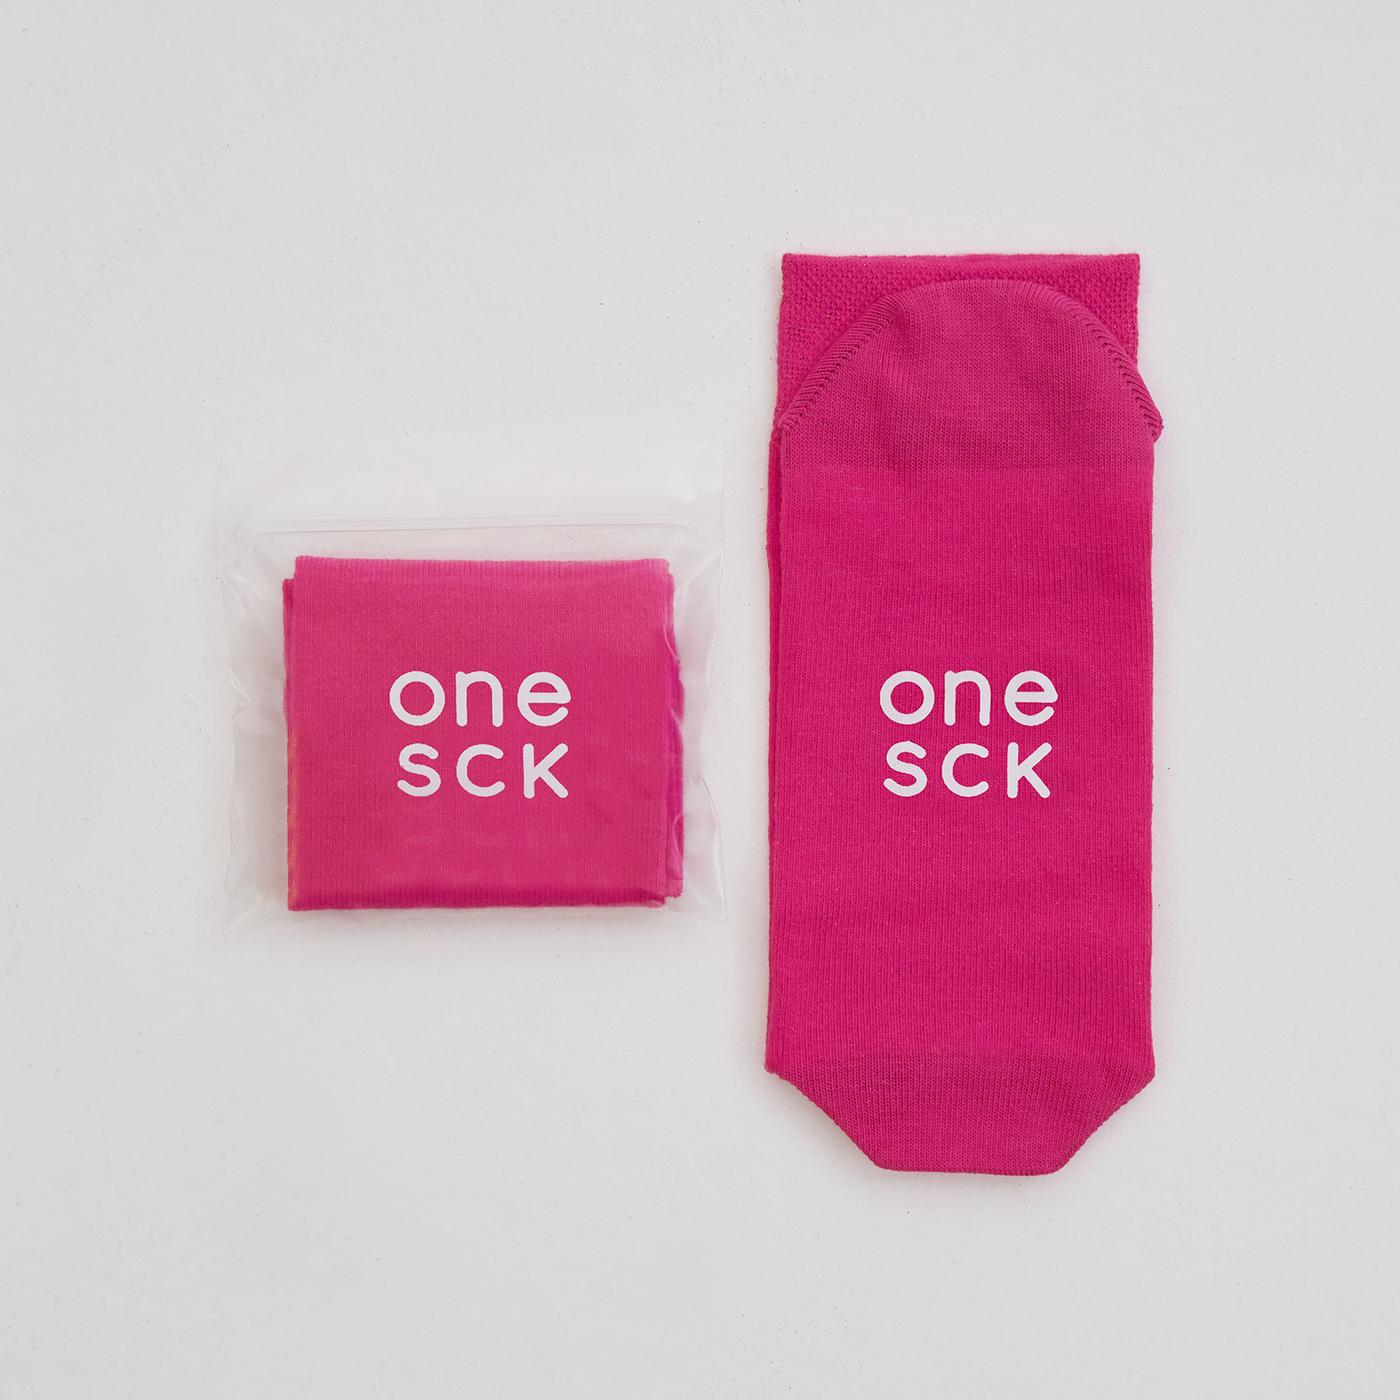 ONESCK Hot Pink One Unisex Pembe Çorap